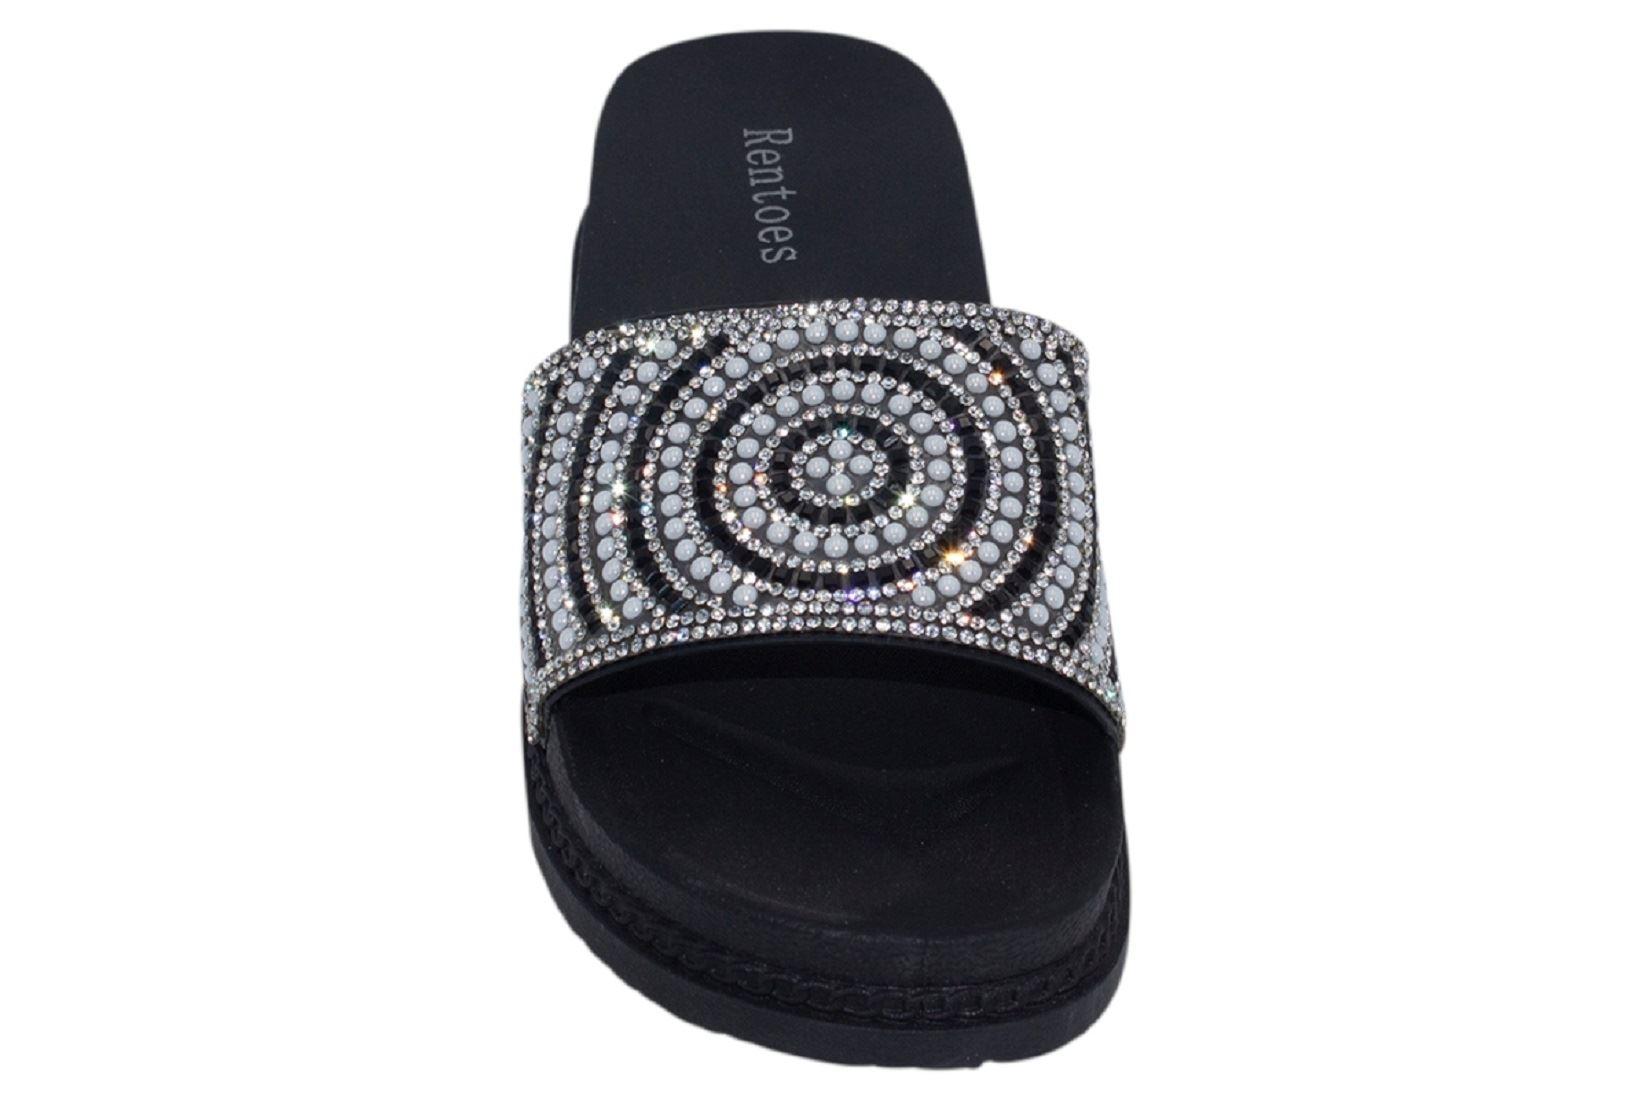 Womens-Sliders-Casual-Slippers-Mules-Ladies-Diamante-Flip-Flop-Sandals-Shoes thumbnail 46